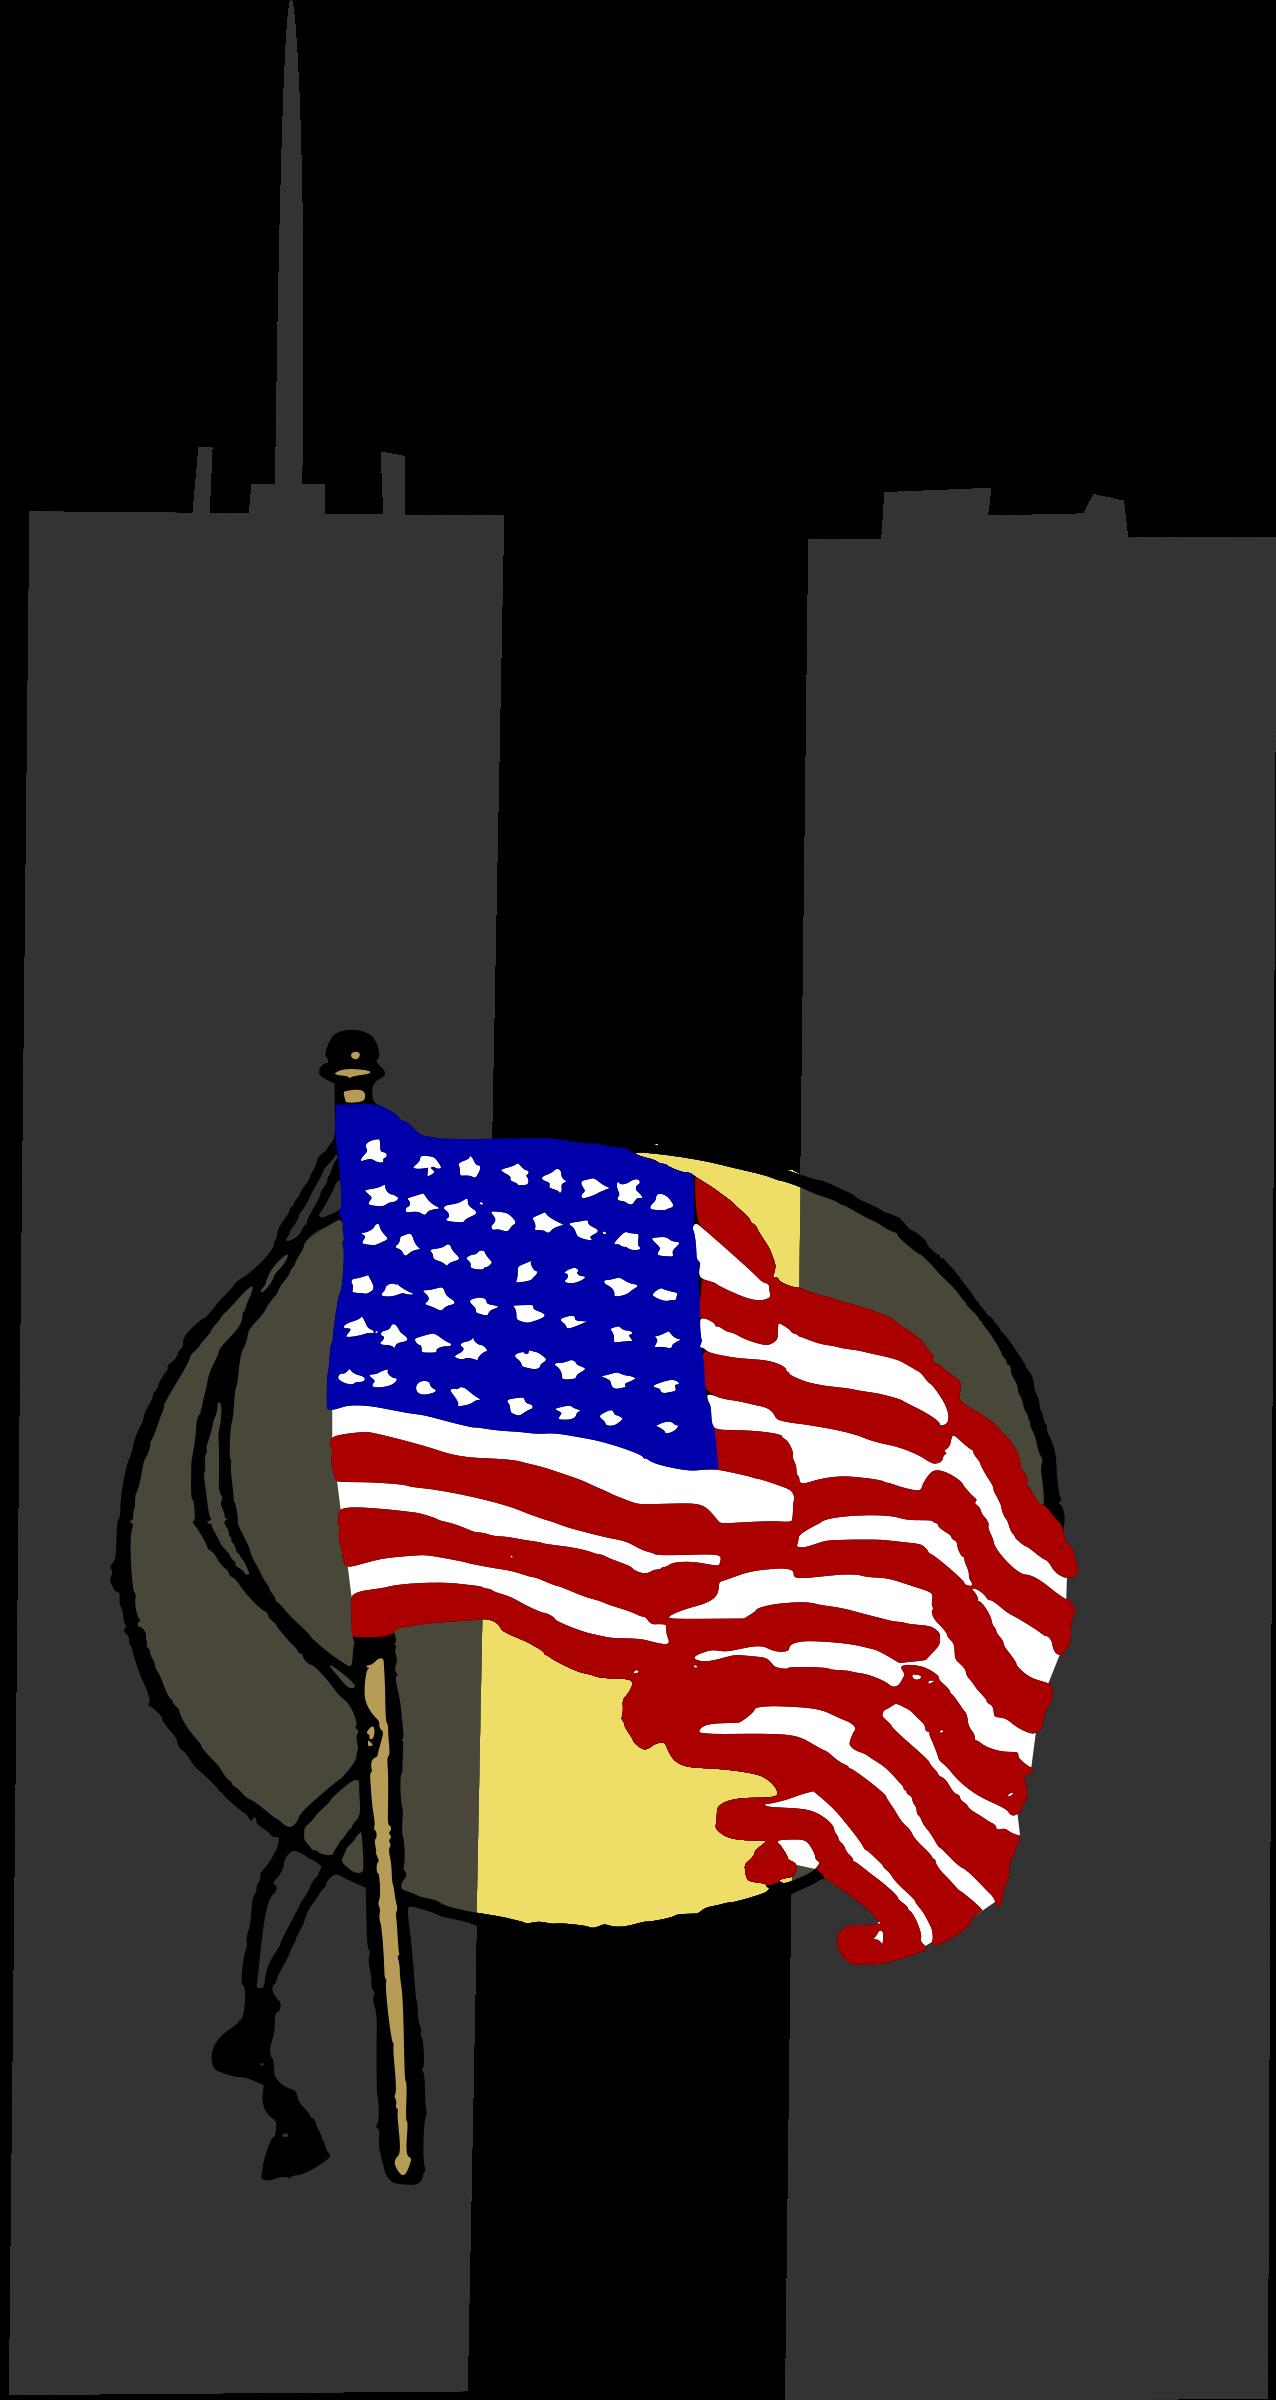 banner free download Wtc ny big image. 9 11 clipart memoriam